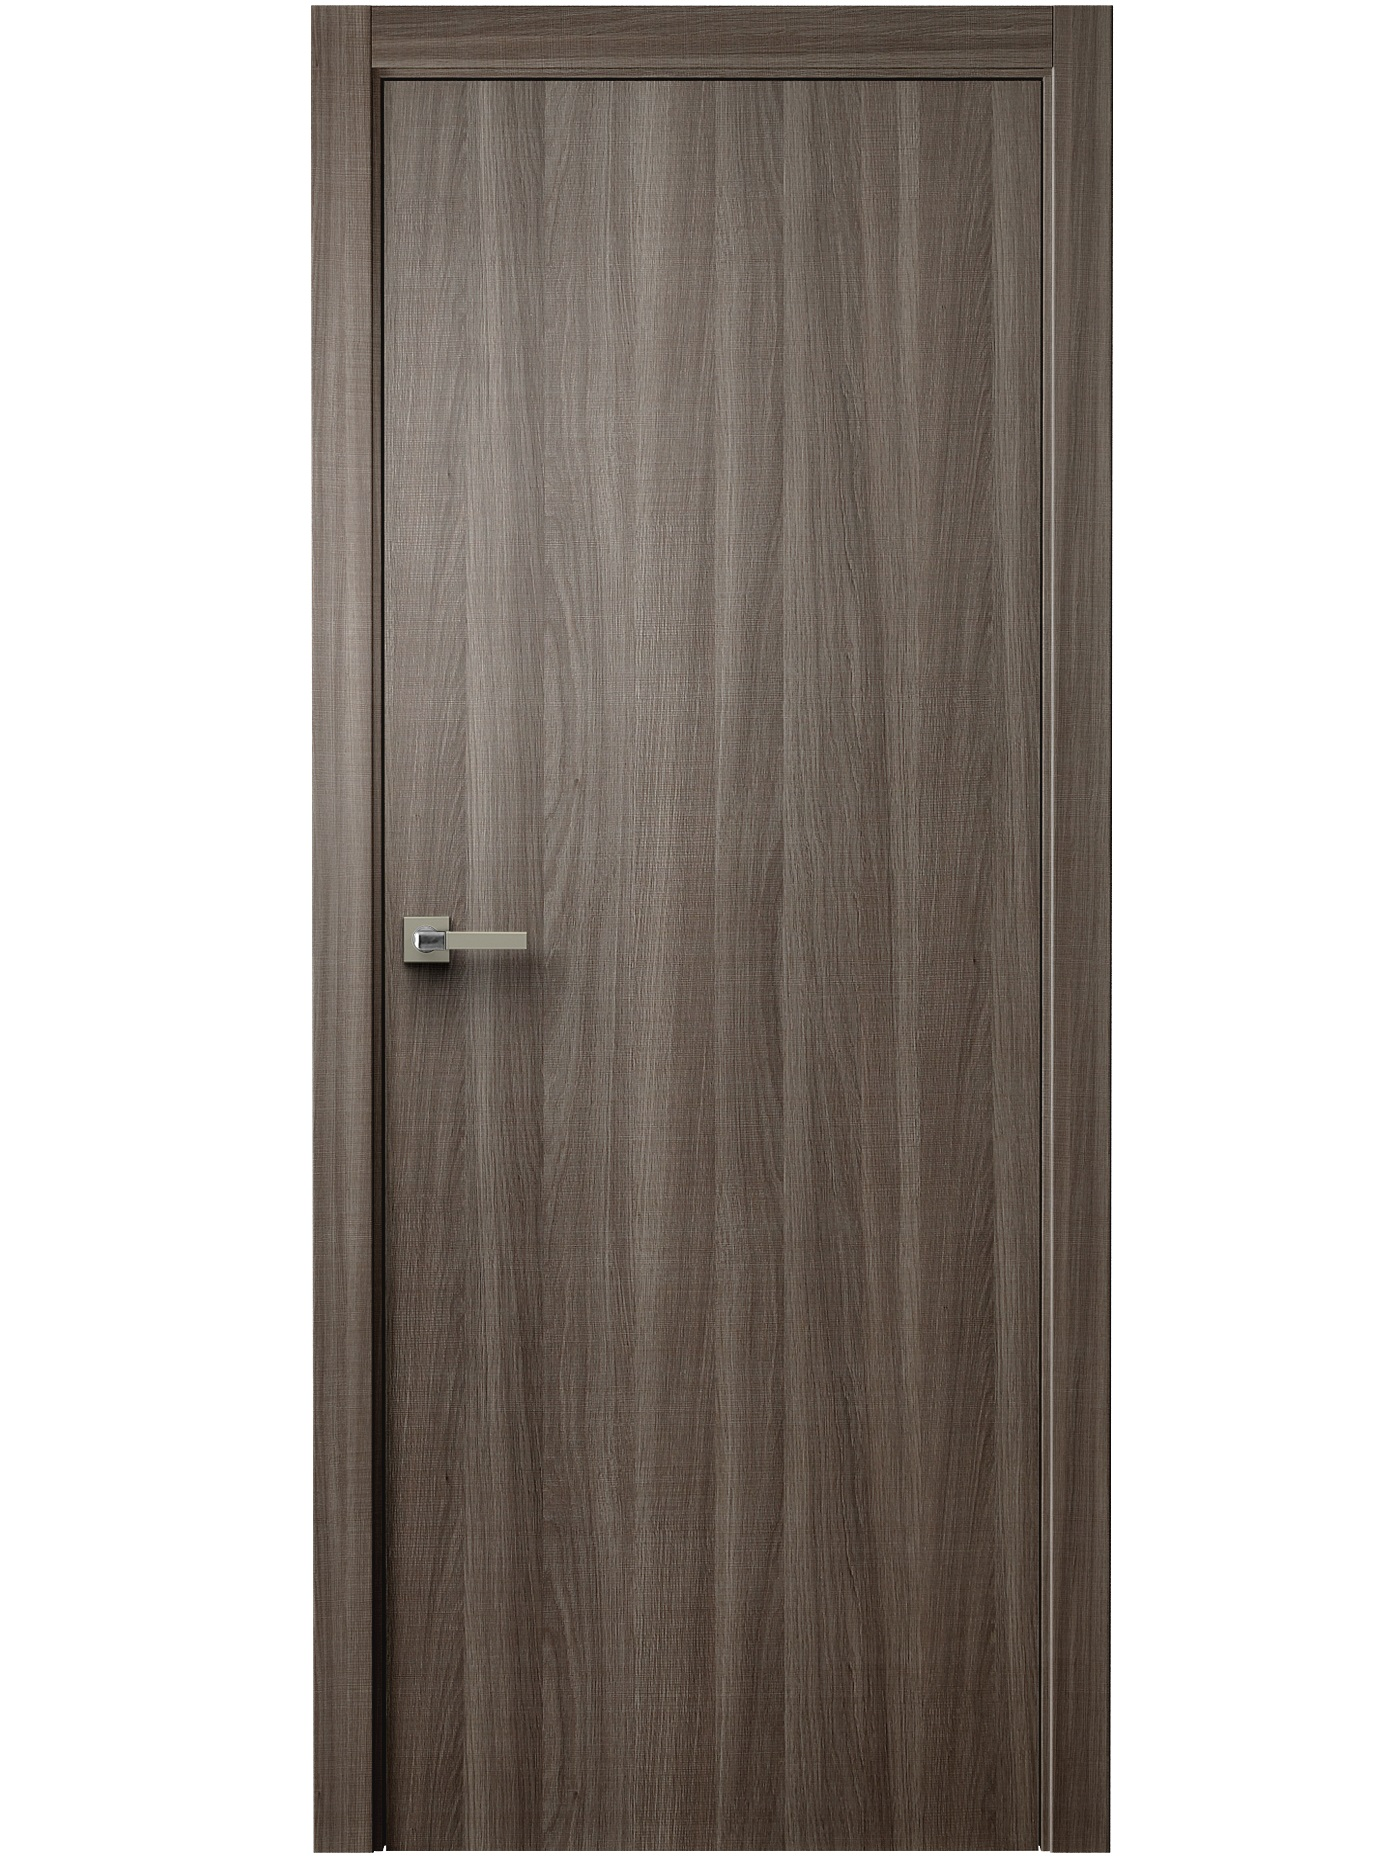 Image Unica Interior Door Walnut Cut 0